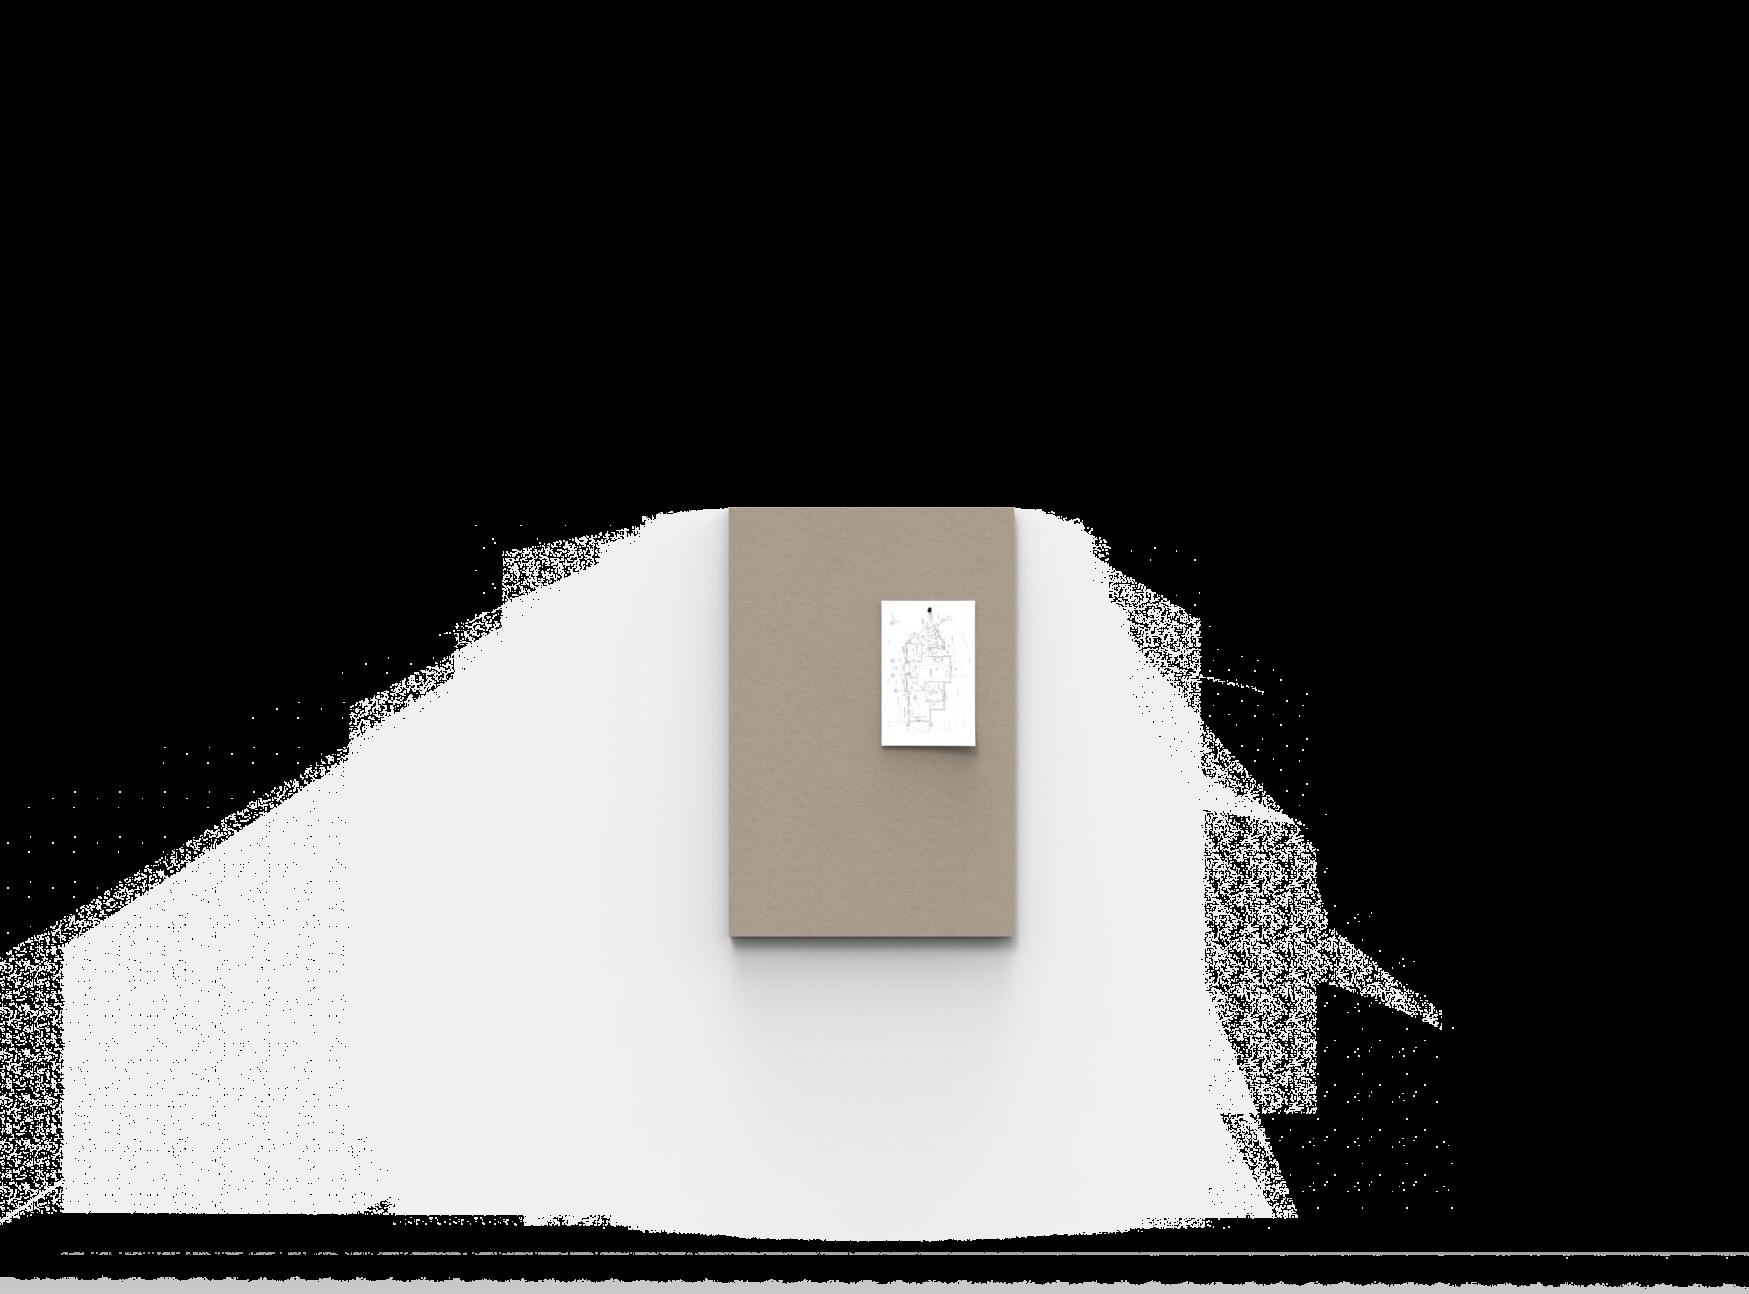 595 x 895